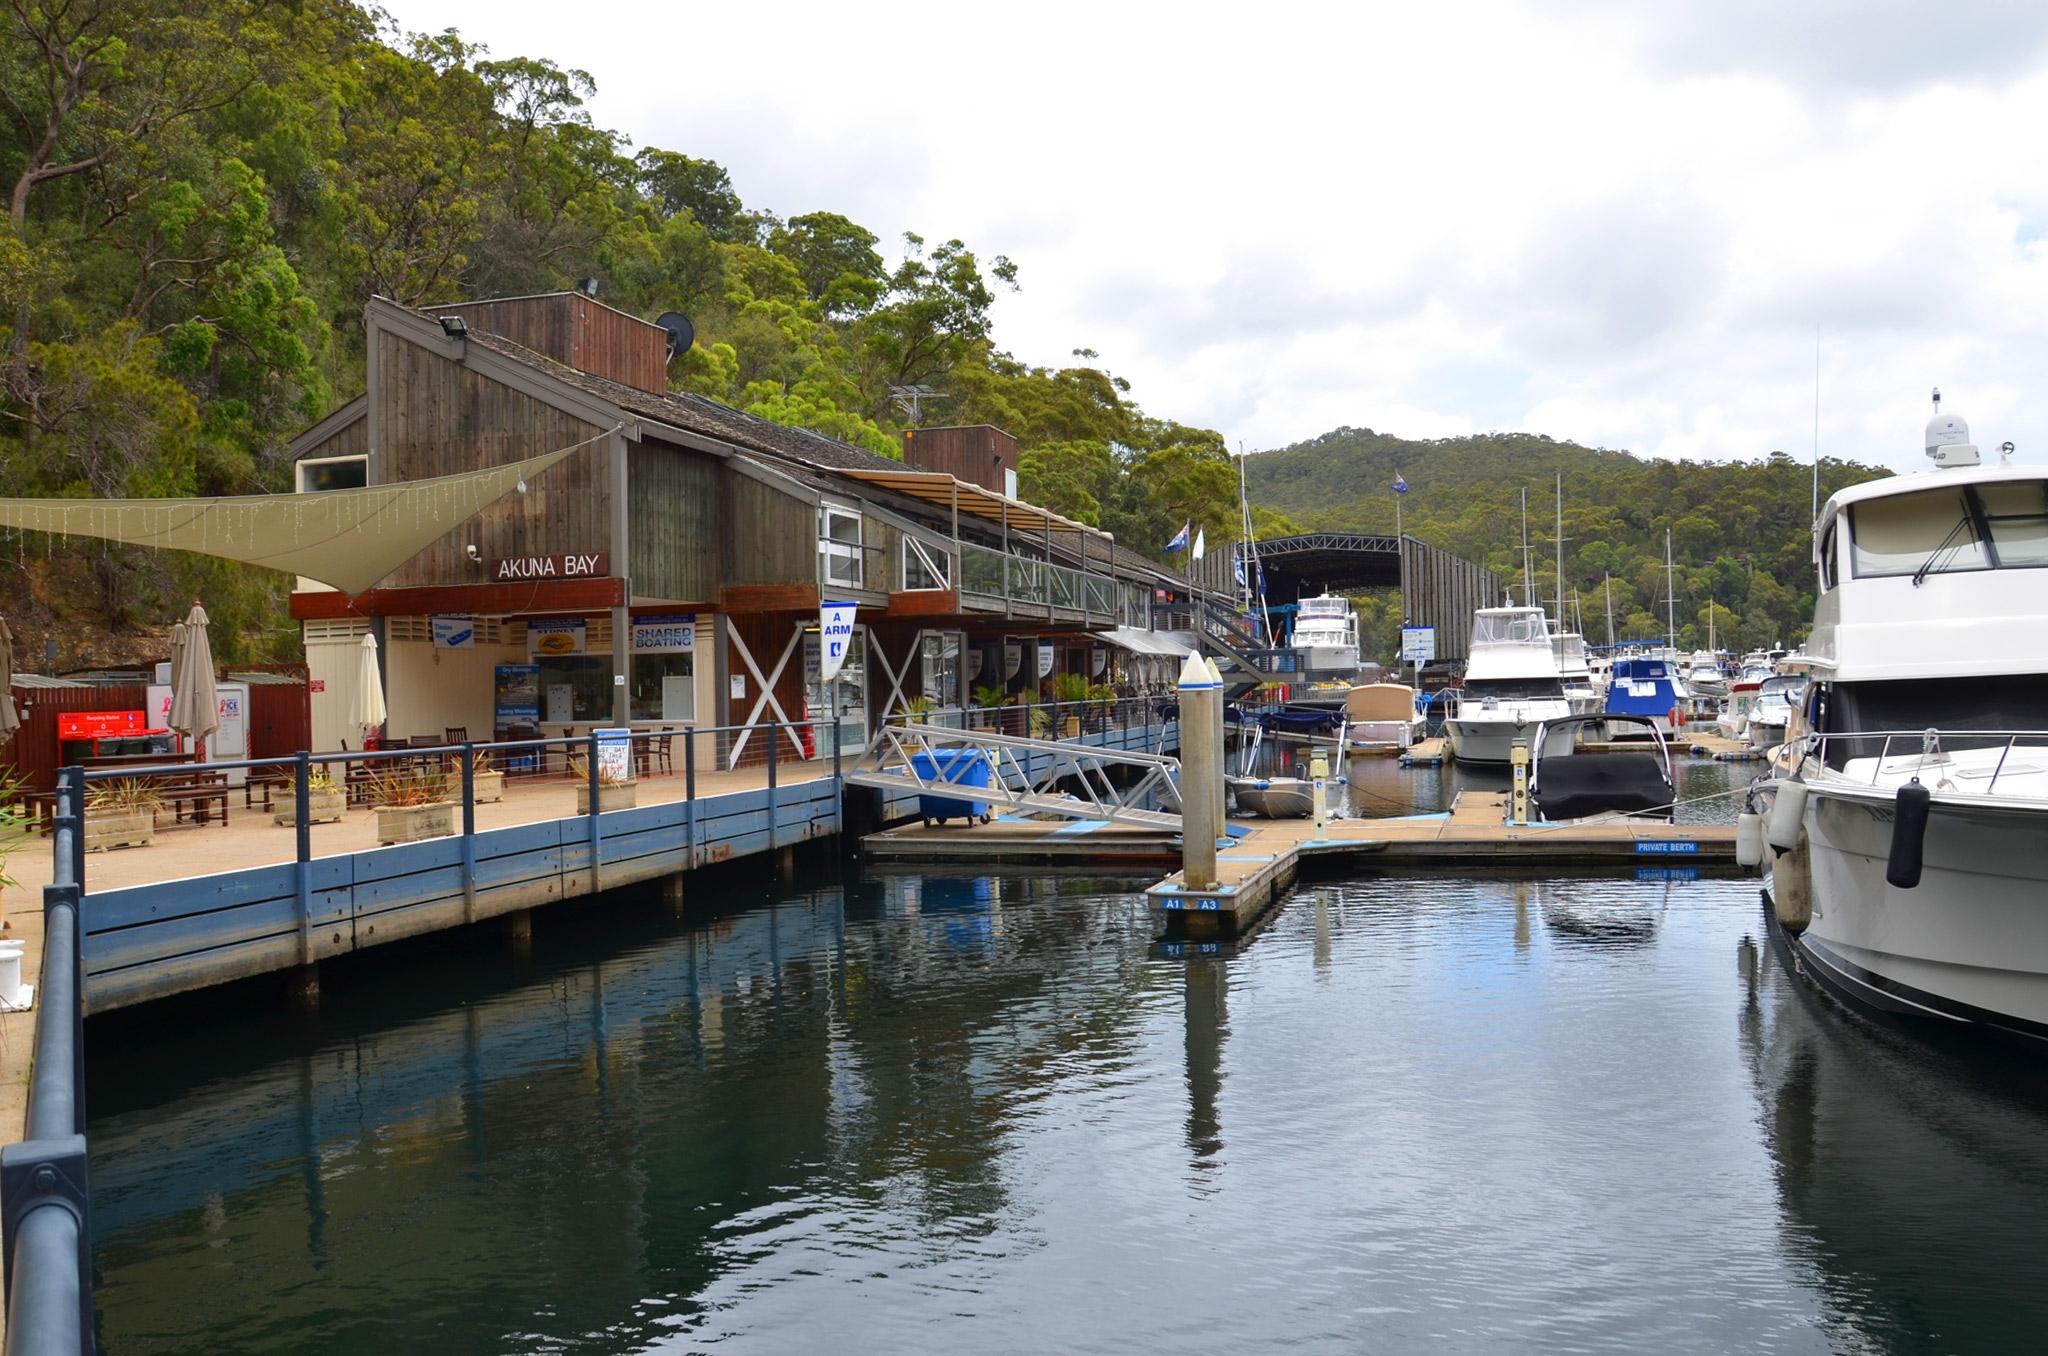 Akuna Bay - Image �2014 ManlyAustralia.com